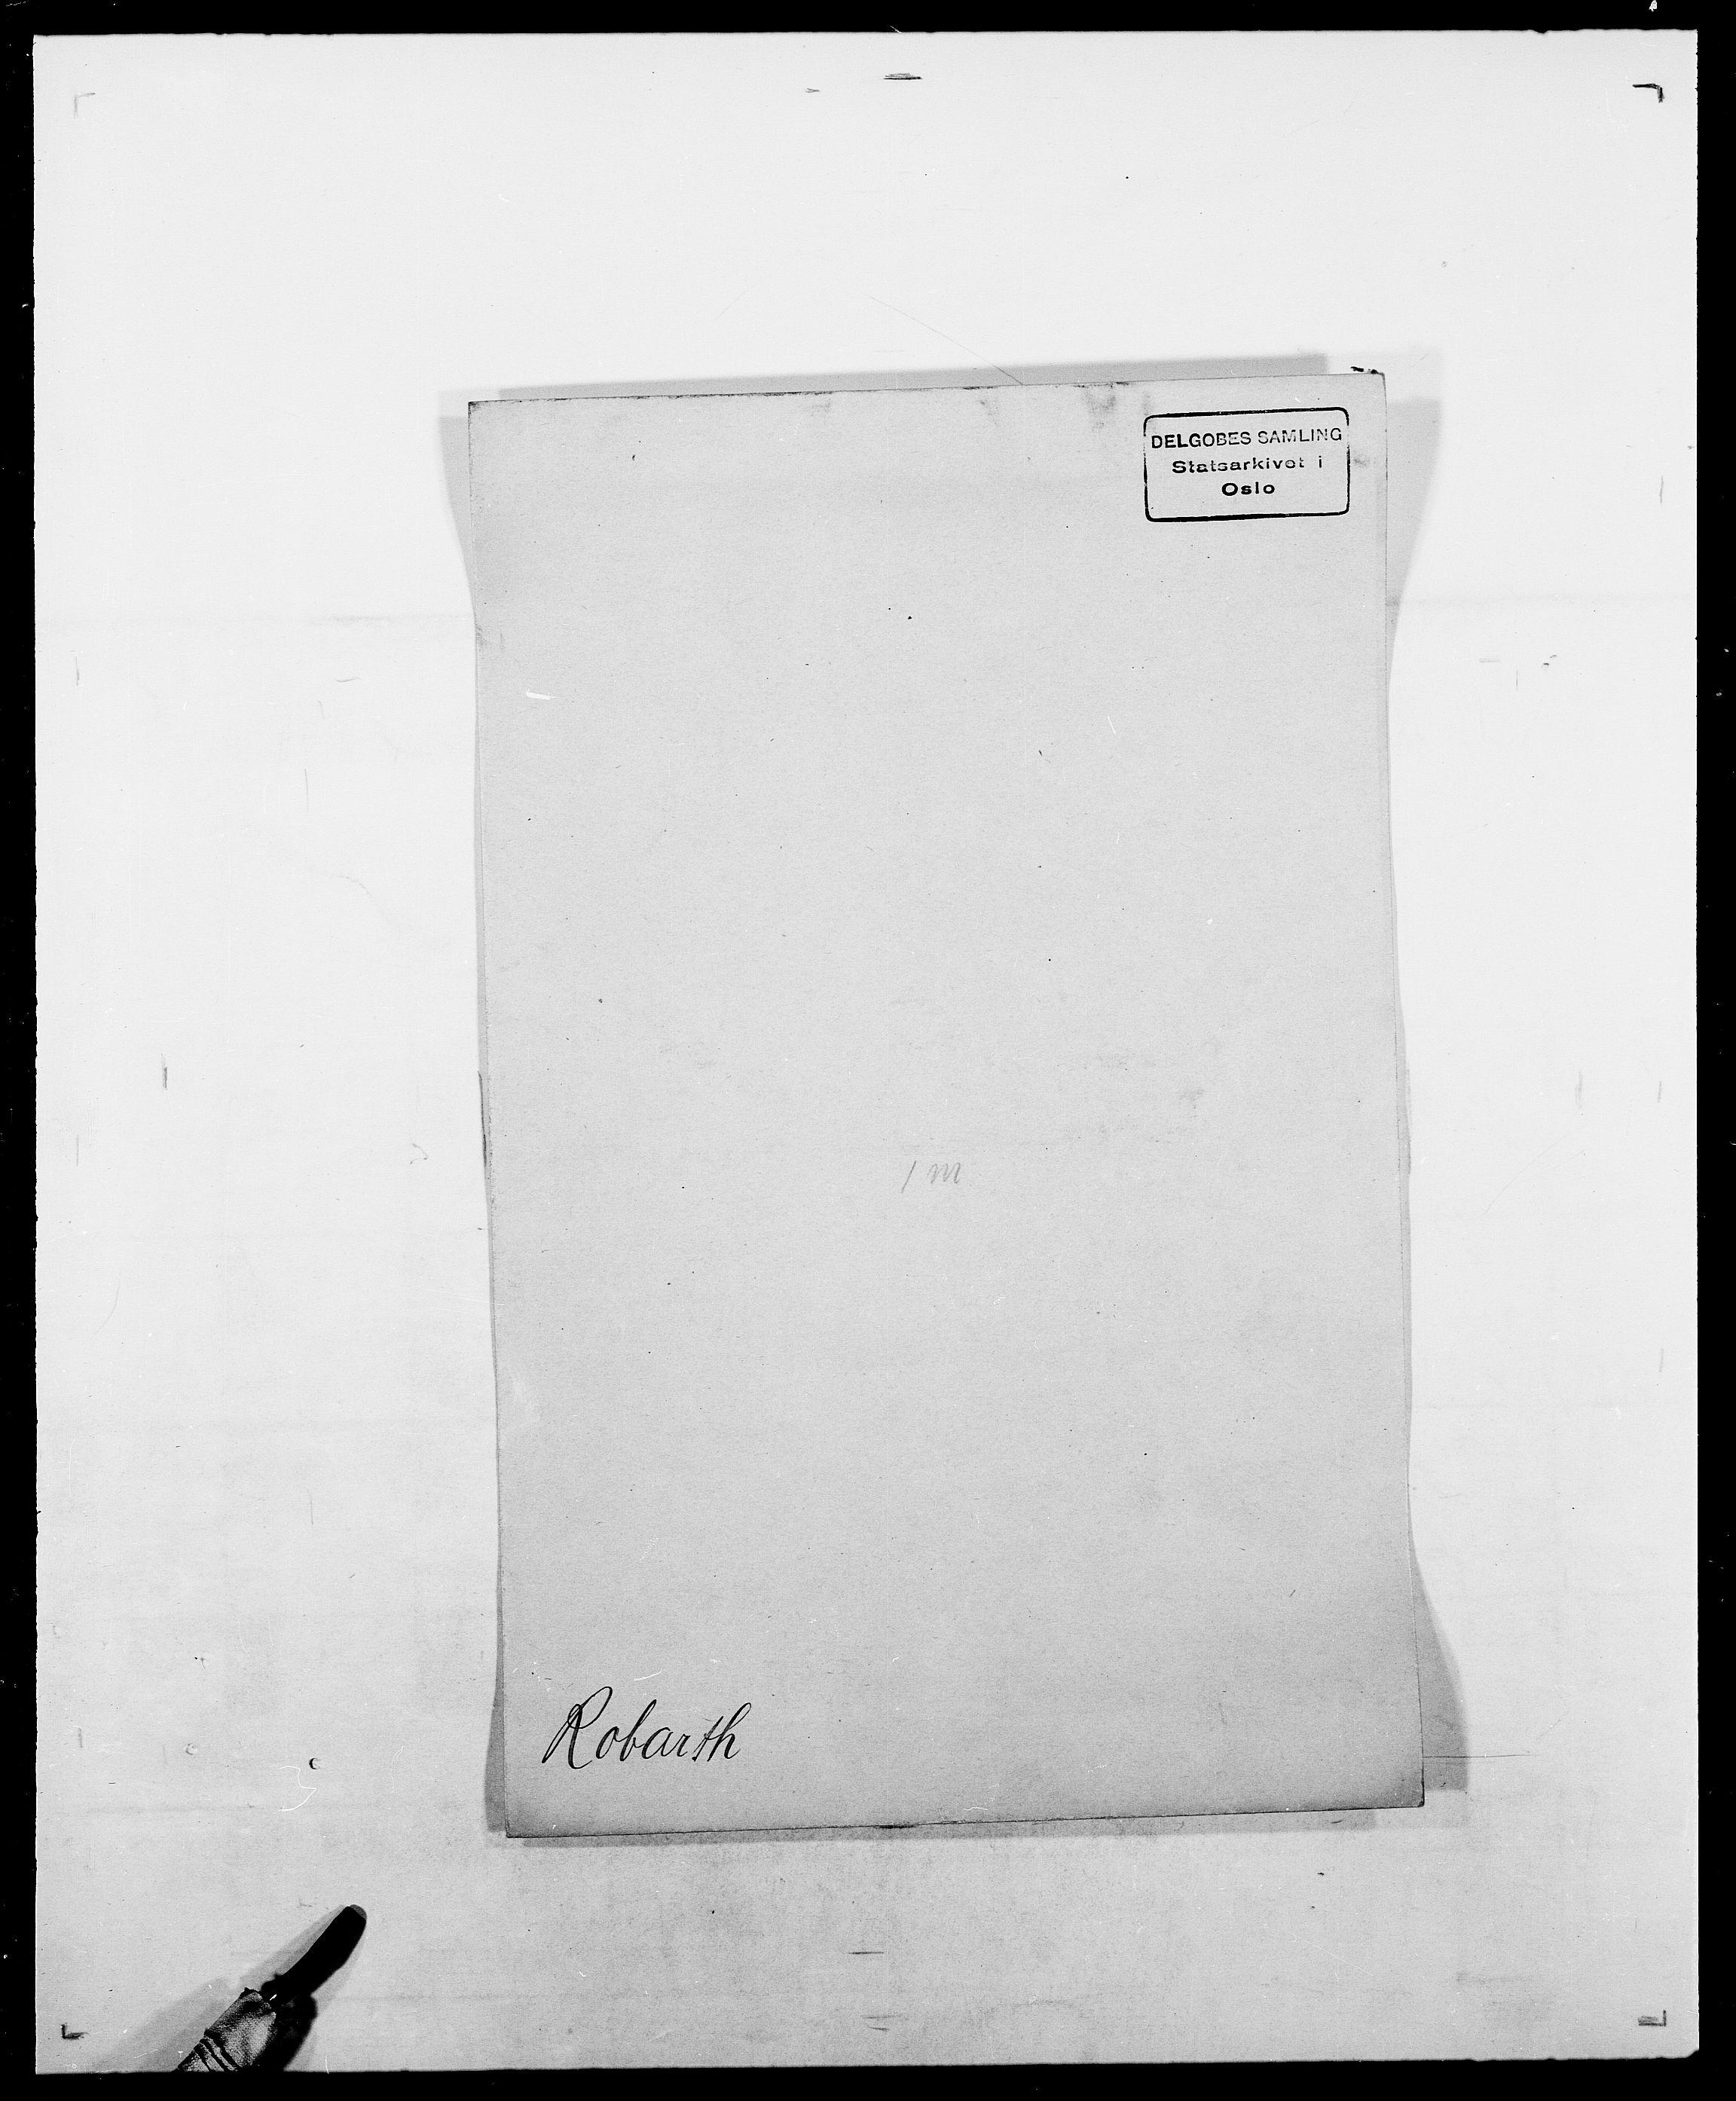 SAO, Delgobe, Charles Antoine - samling, D/Da/L0033: Roald - Røyem, s. 3